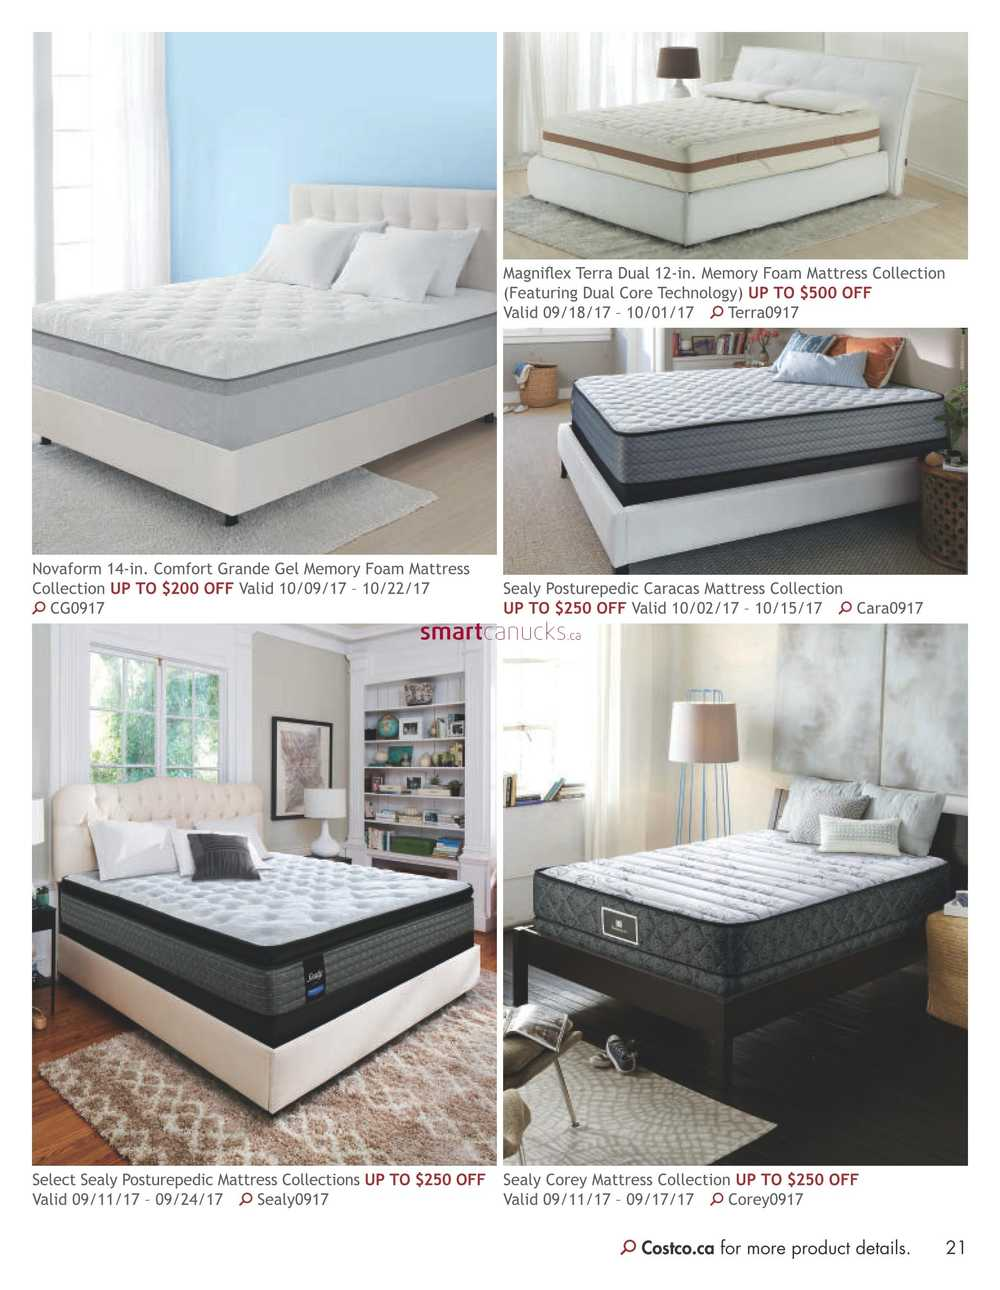 novaform comfort grande. costco online catalogue flyer september 1 to october 31. novaform comfort grande